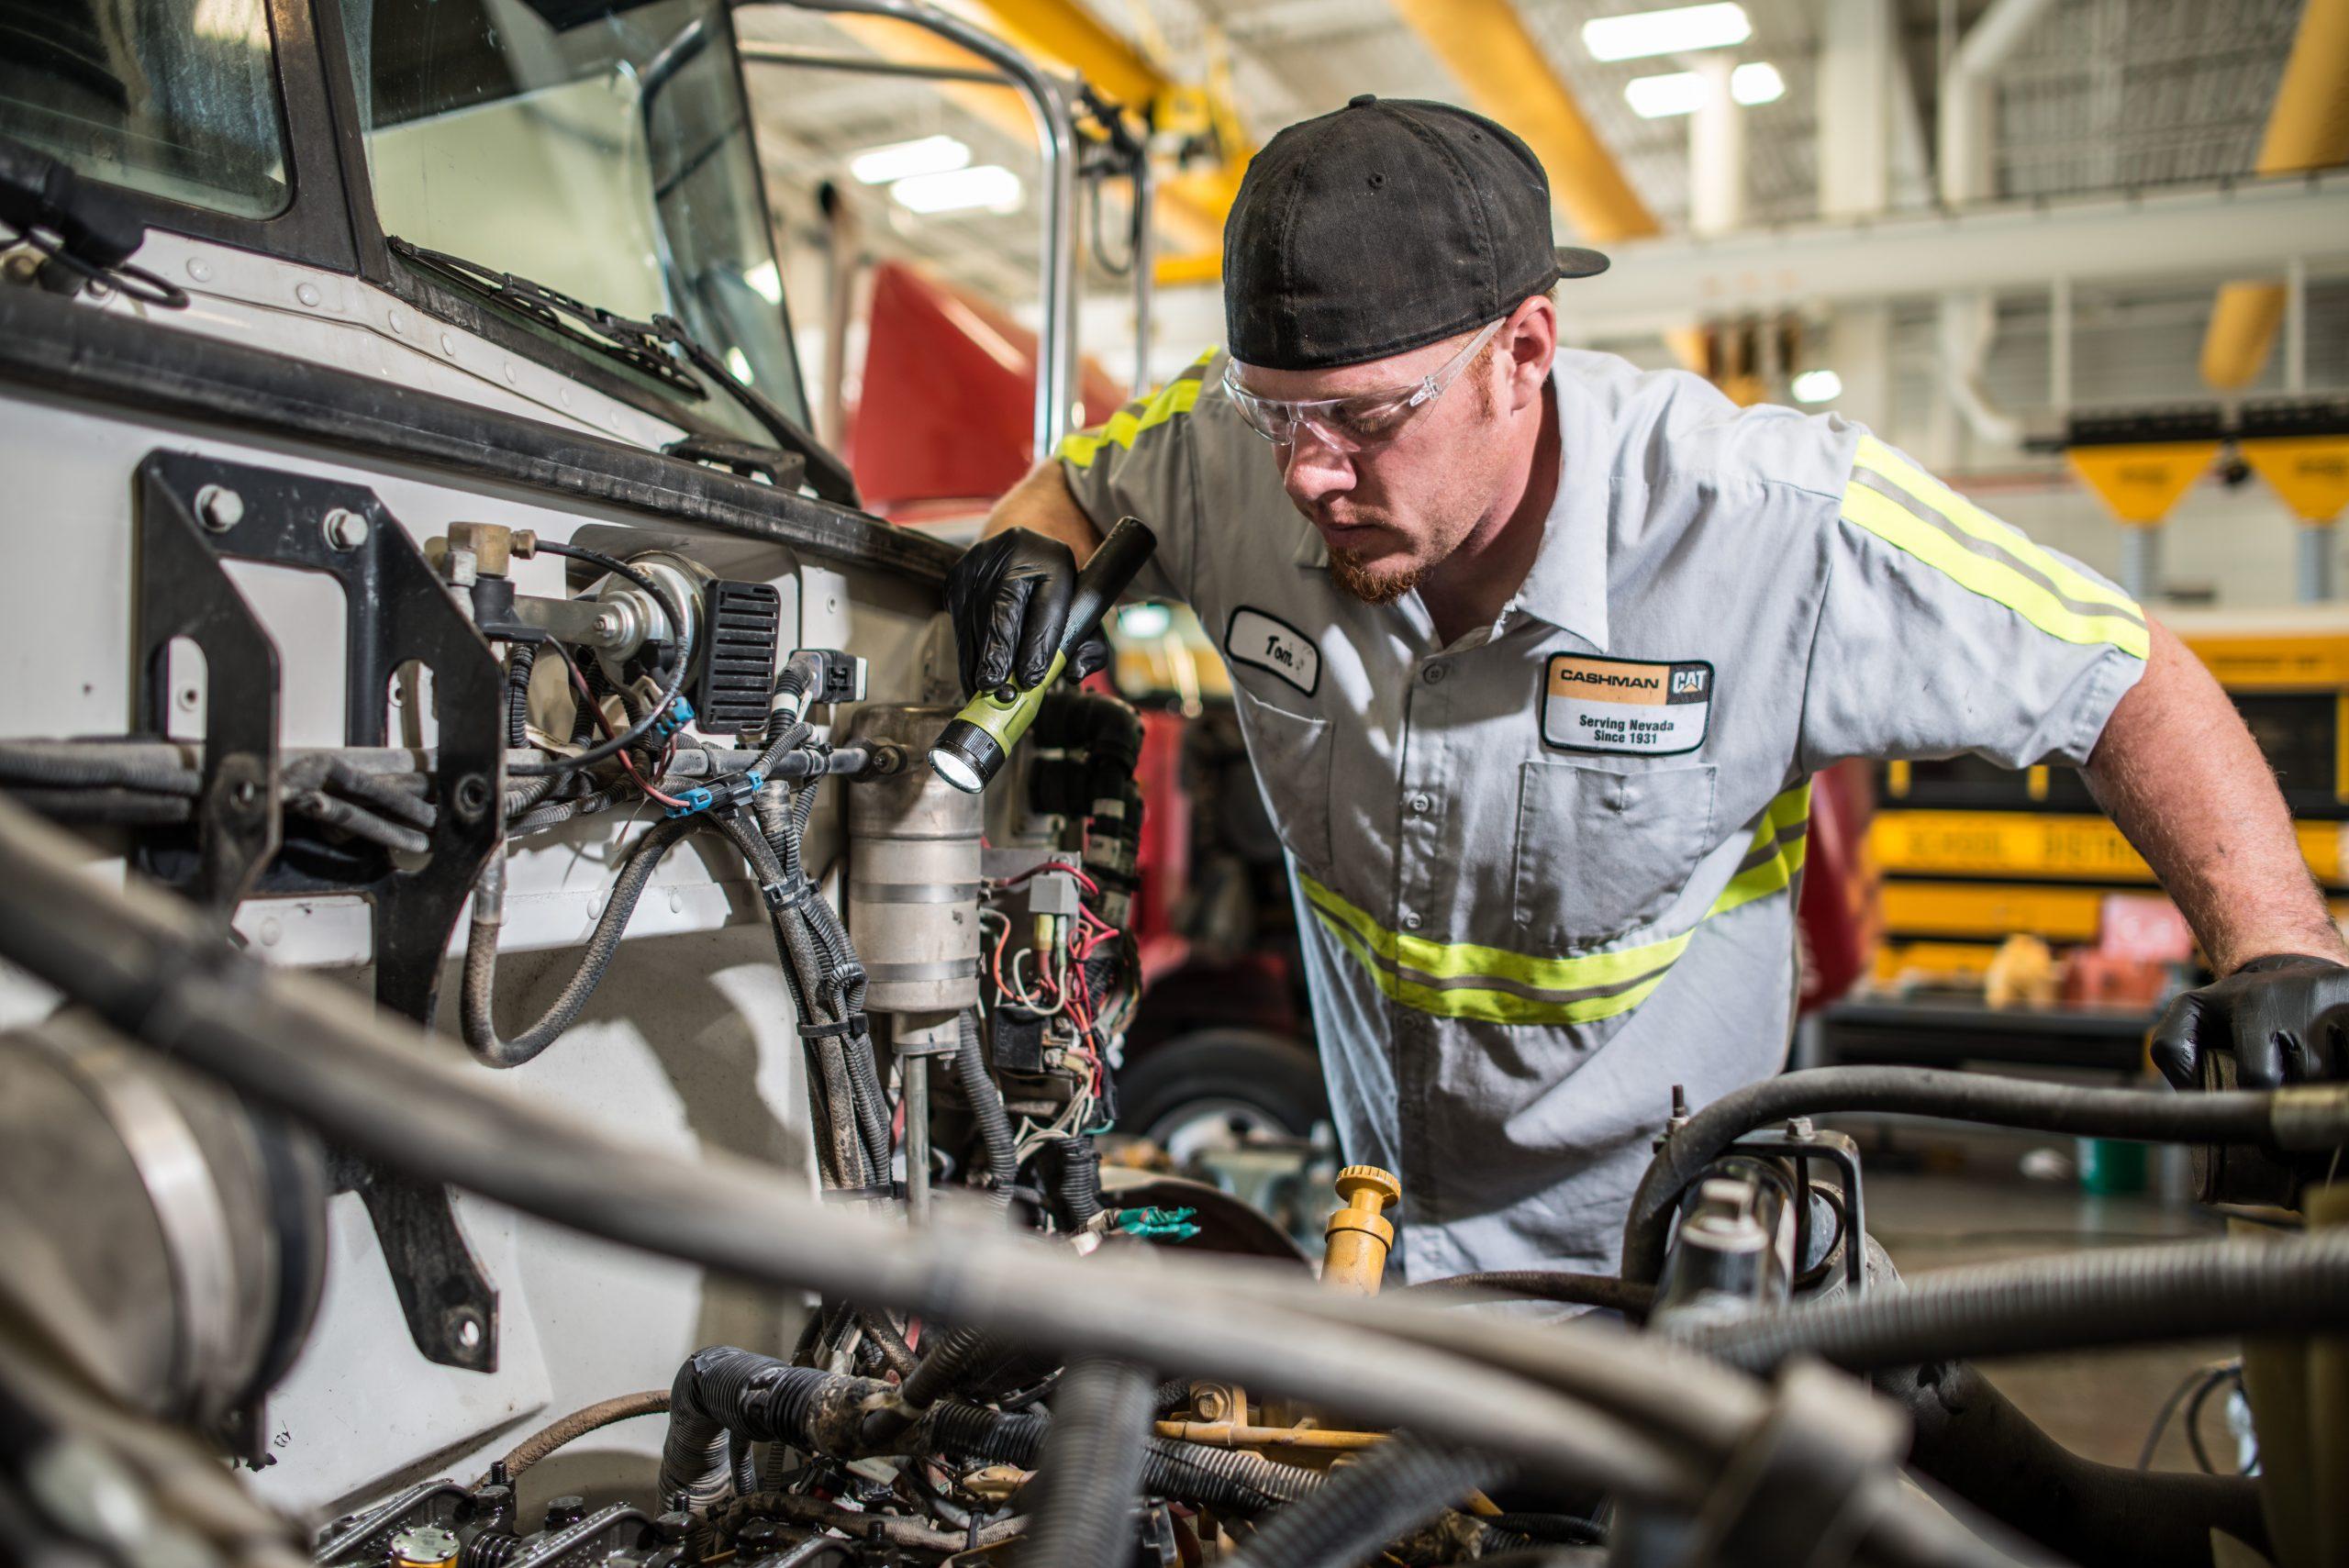 Technician Inspecting Machinery